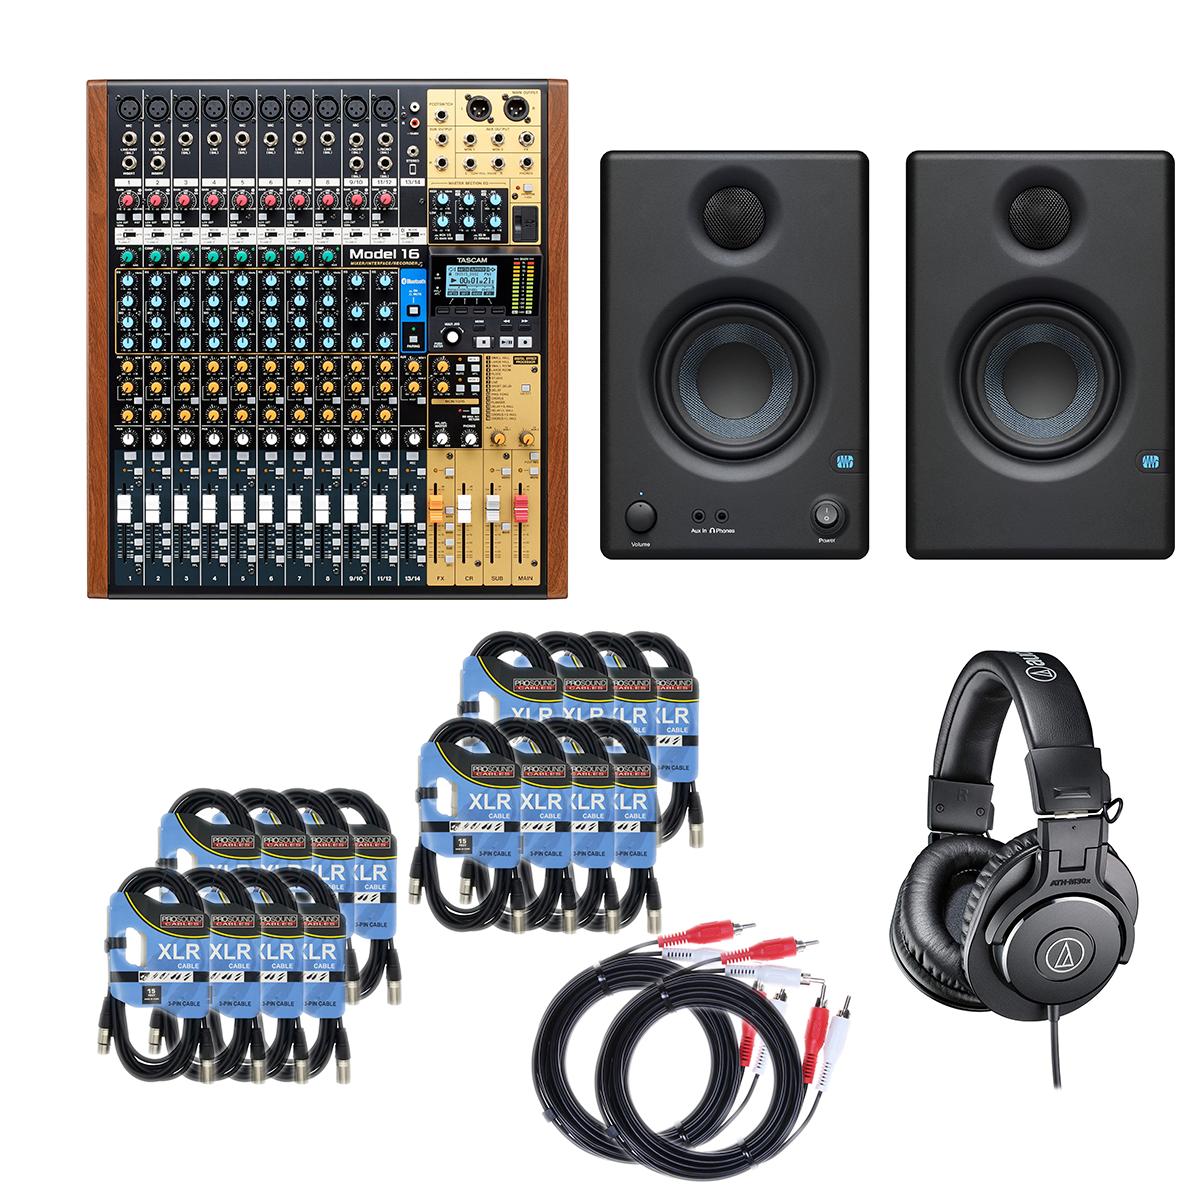 -3 Tascam Model 16 - ATHM30X - RCA Cables 2 - 16 XLR - Presonus Eris3.5 - $879.99